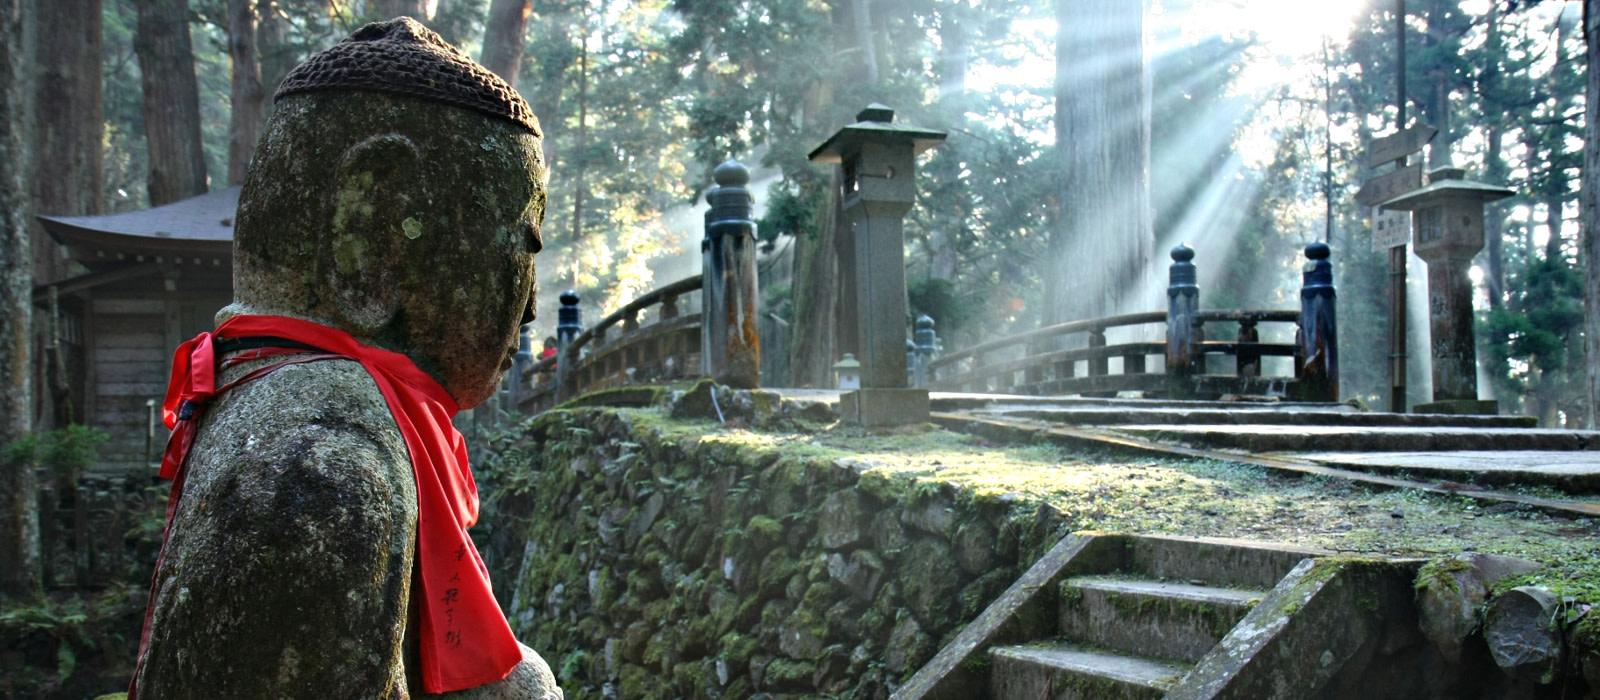 Reiseziel Kōyasan Japan